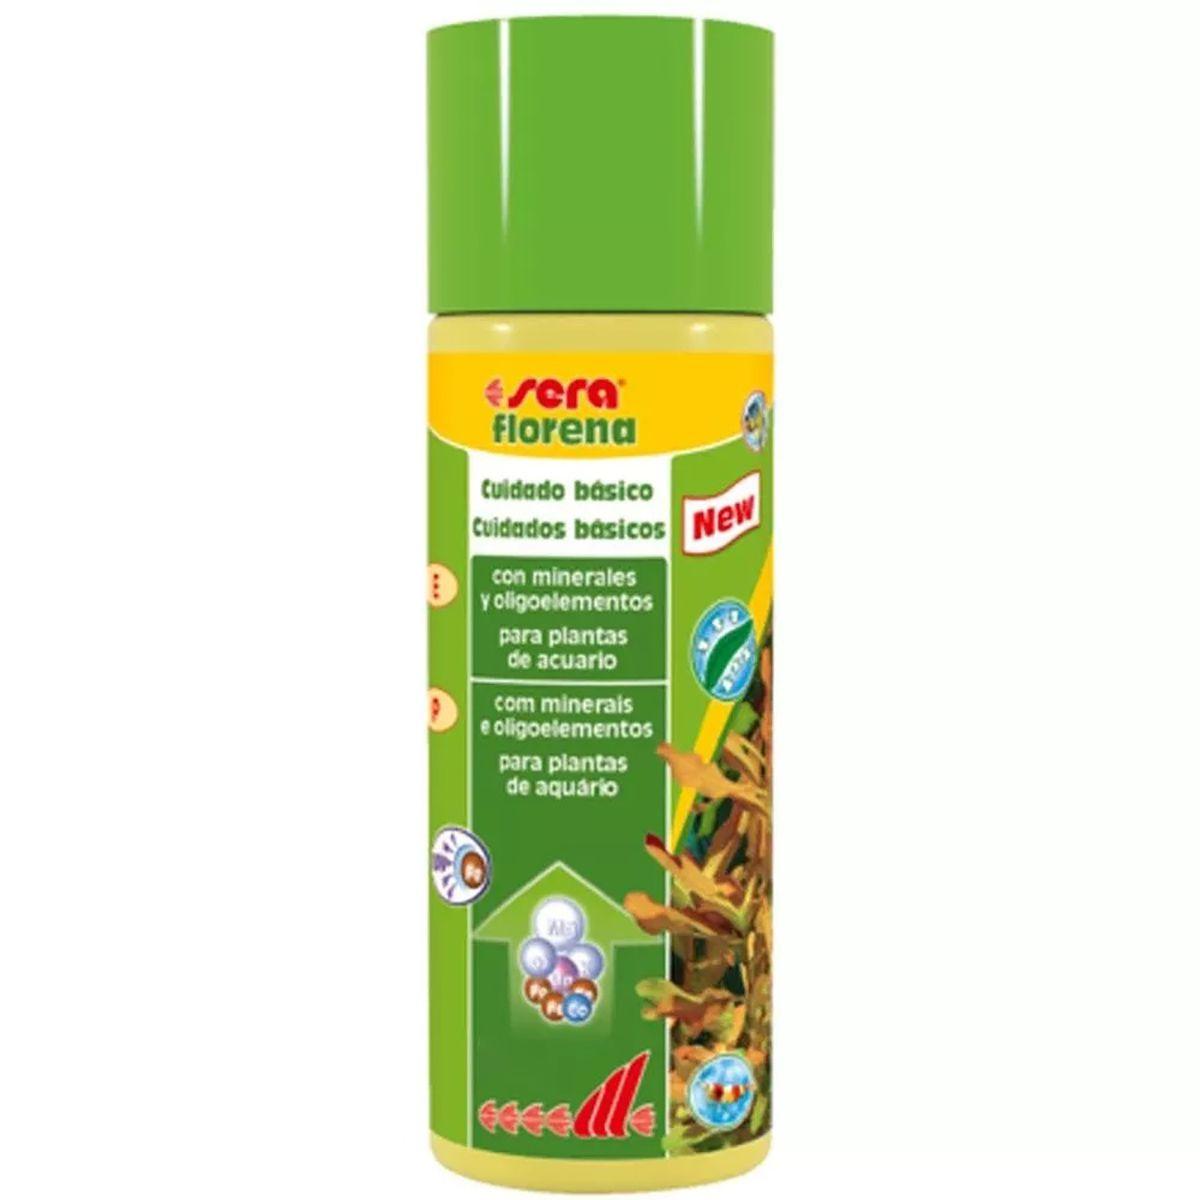 Suplemento para Plantas SERA FLORENA 250ML